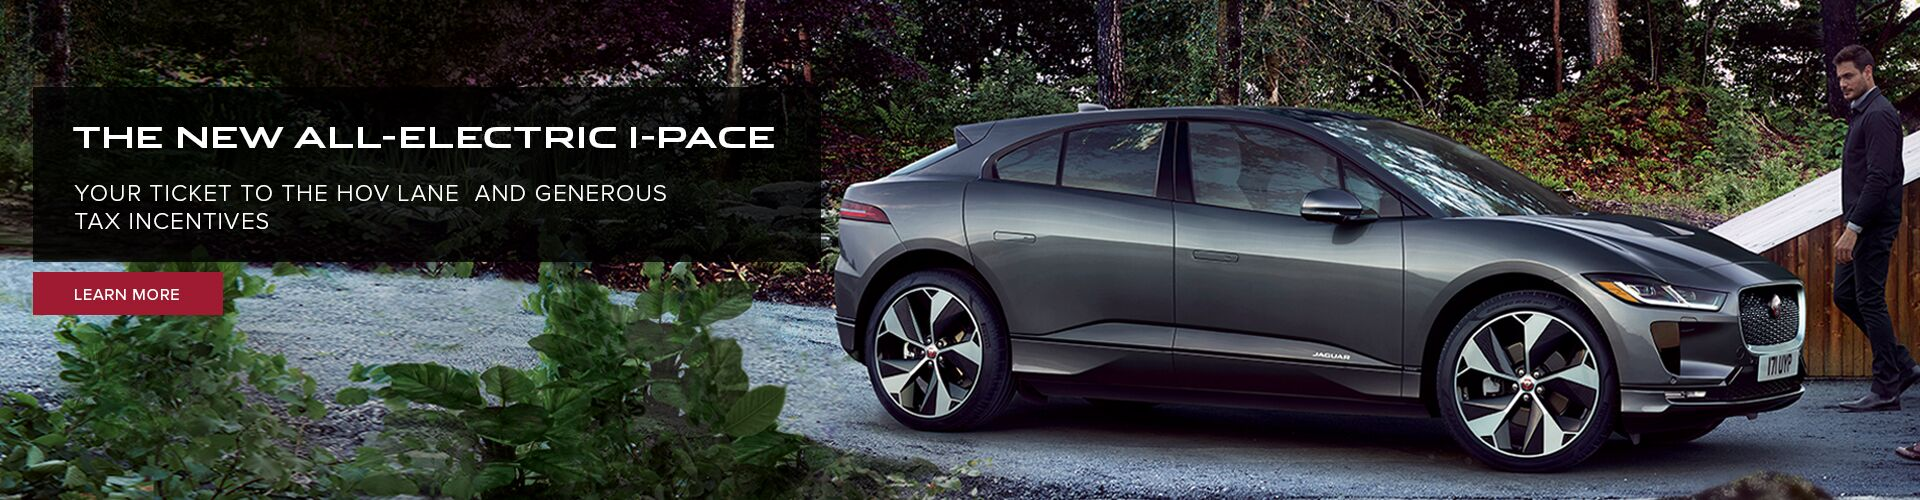 used xj sedan jaguar cargurus cars sale series in l for carmel indianapolis